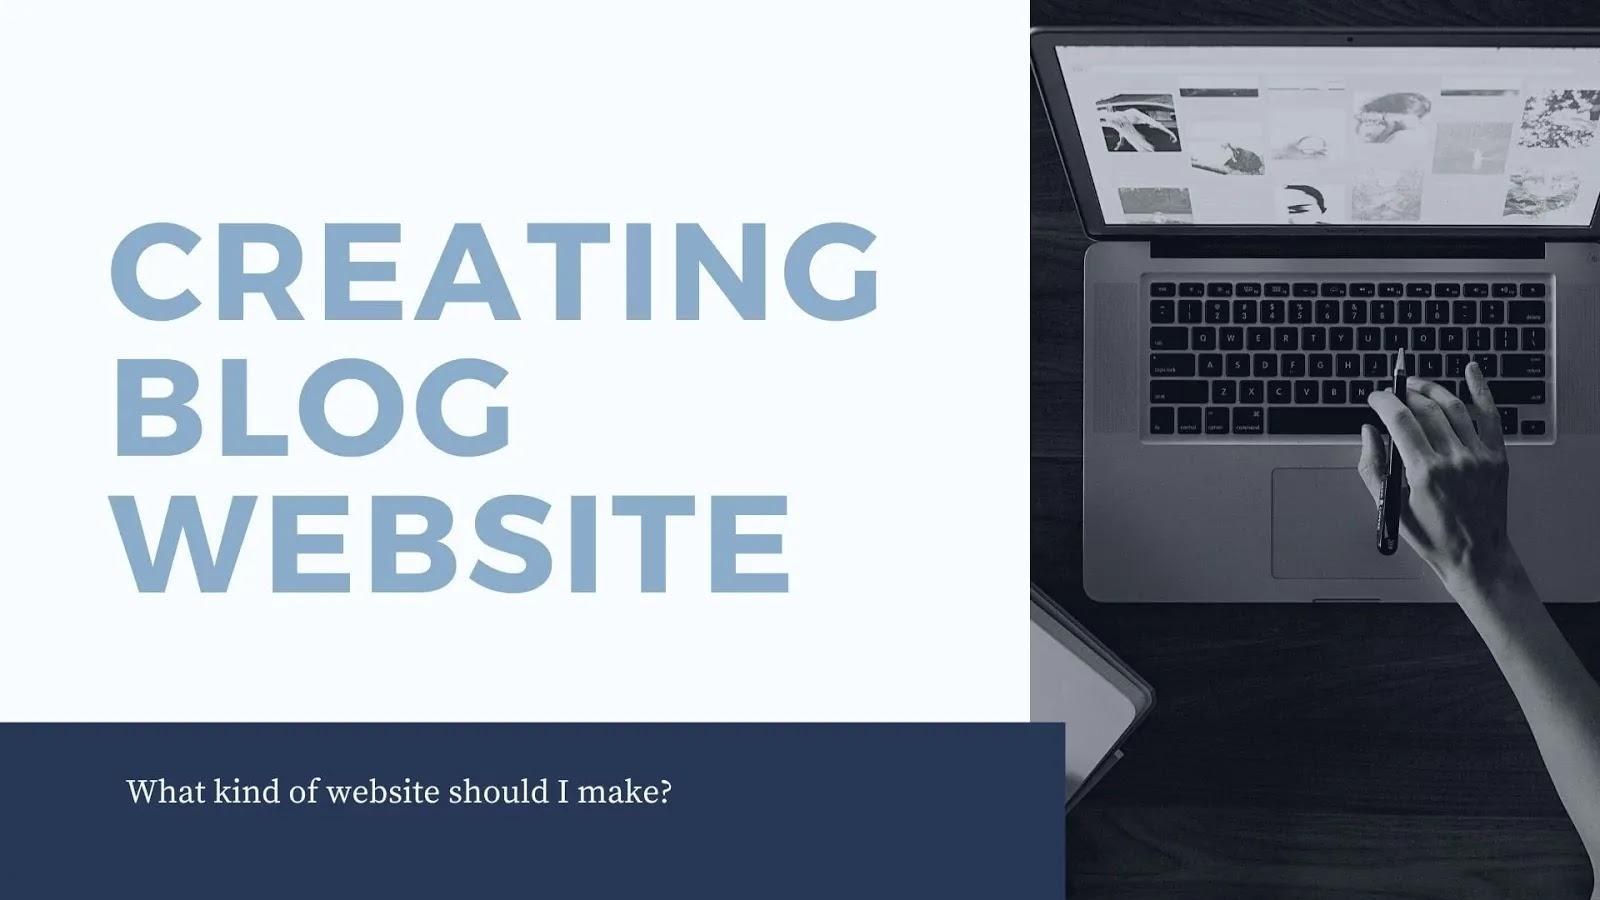 Creating a blog website